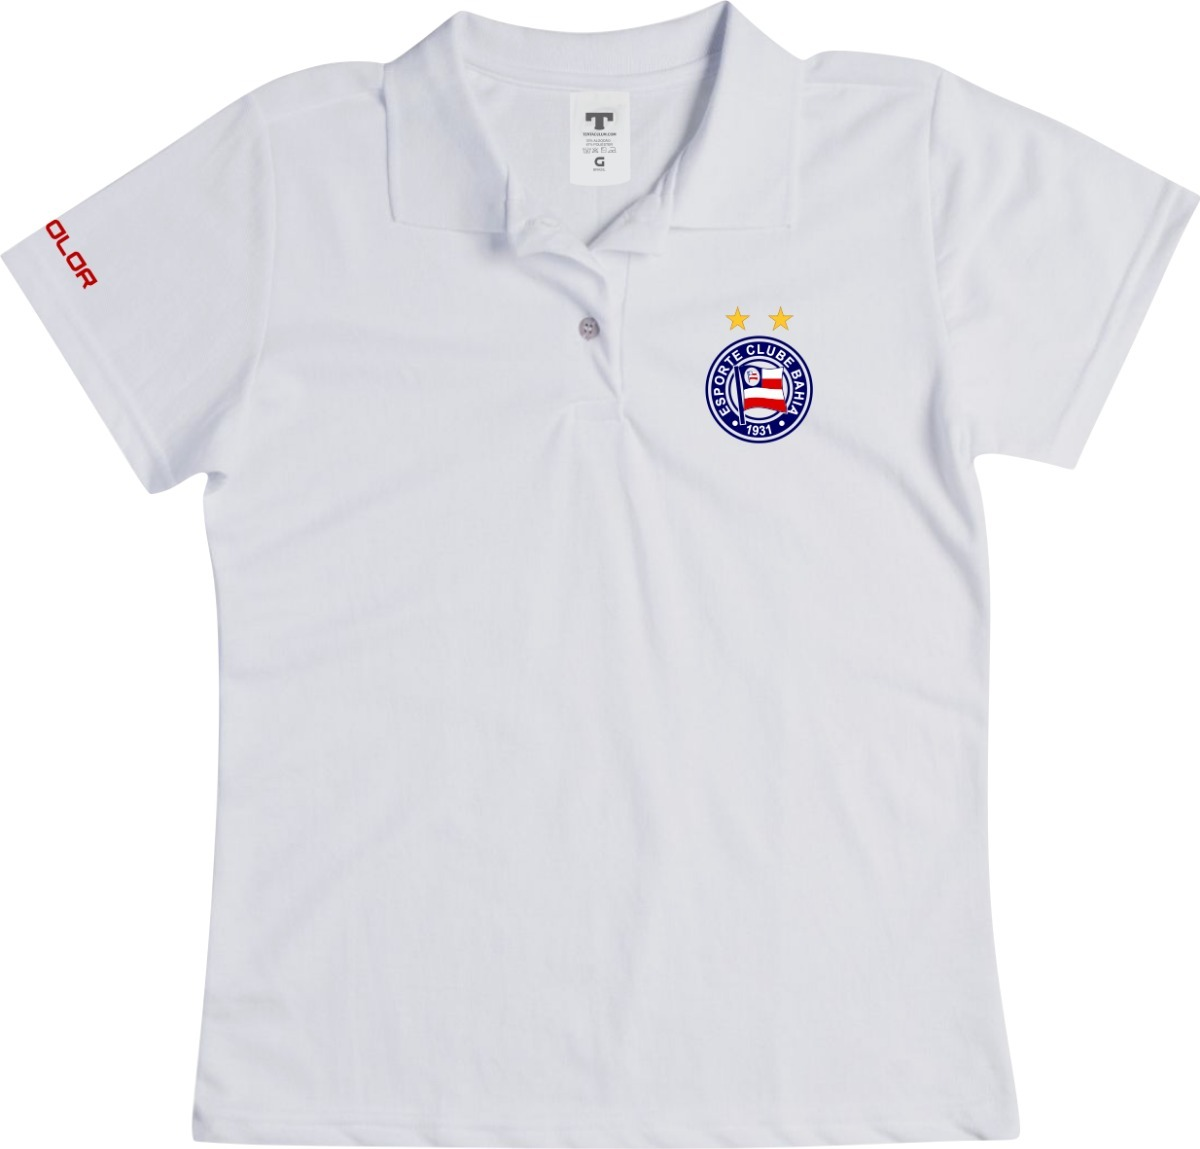 Camisa Feminina Personalizada Do Bahia - R  69 2dbaa17d23afa